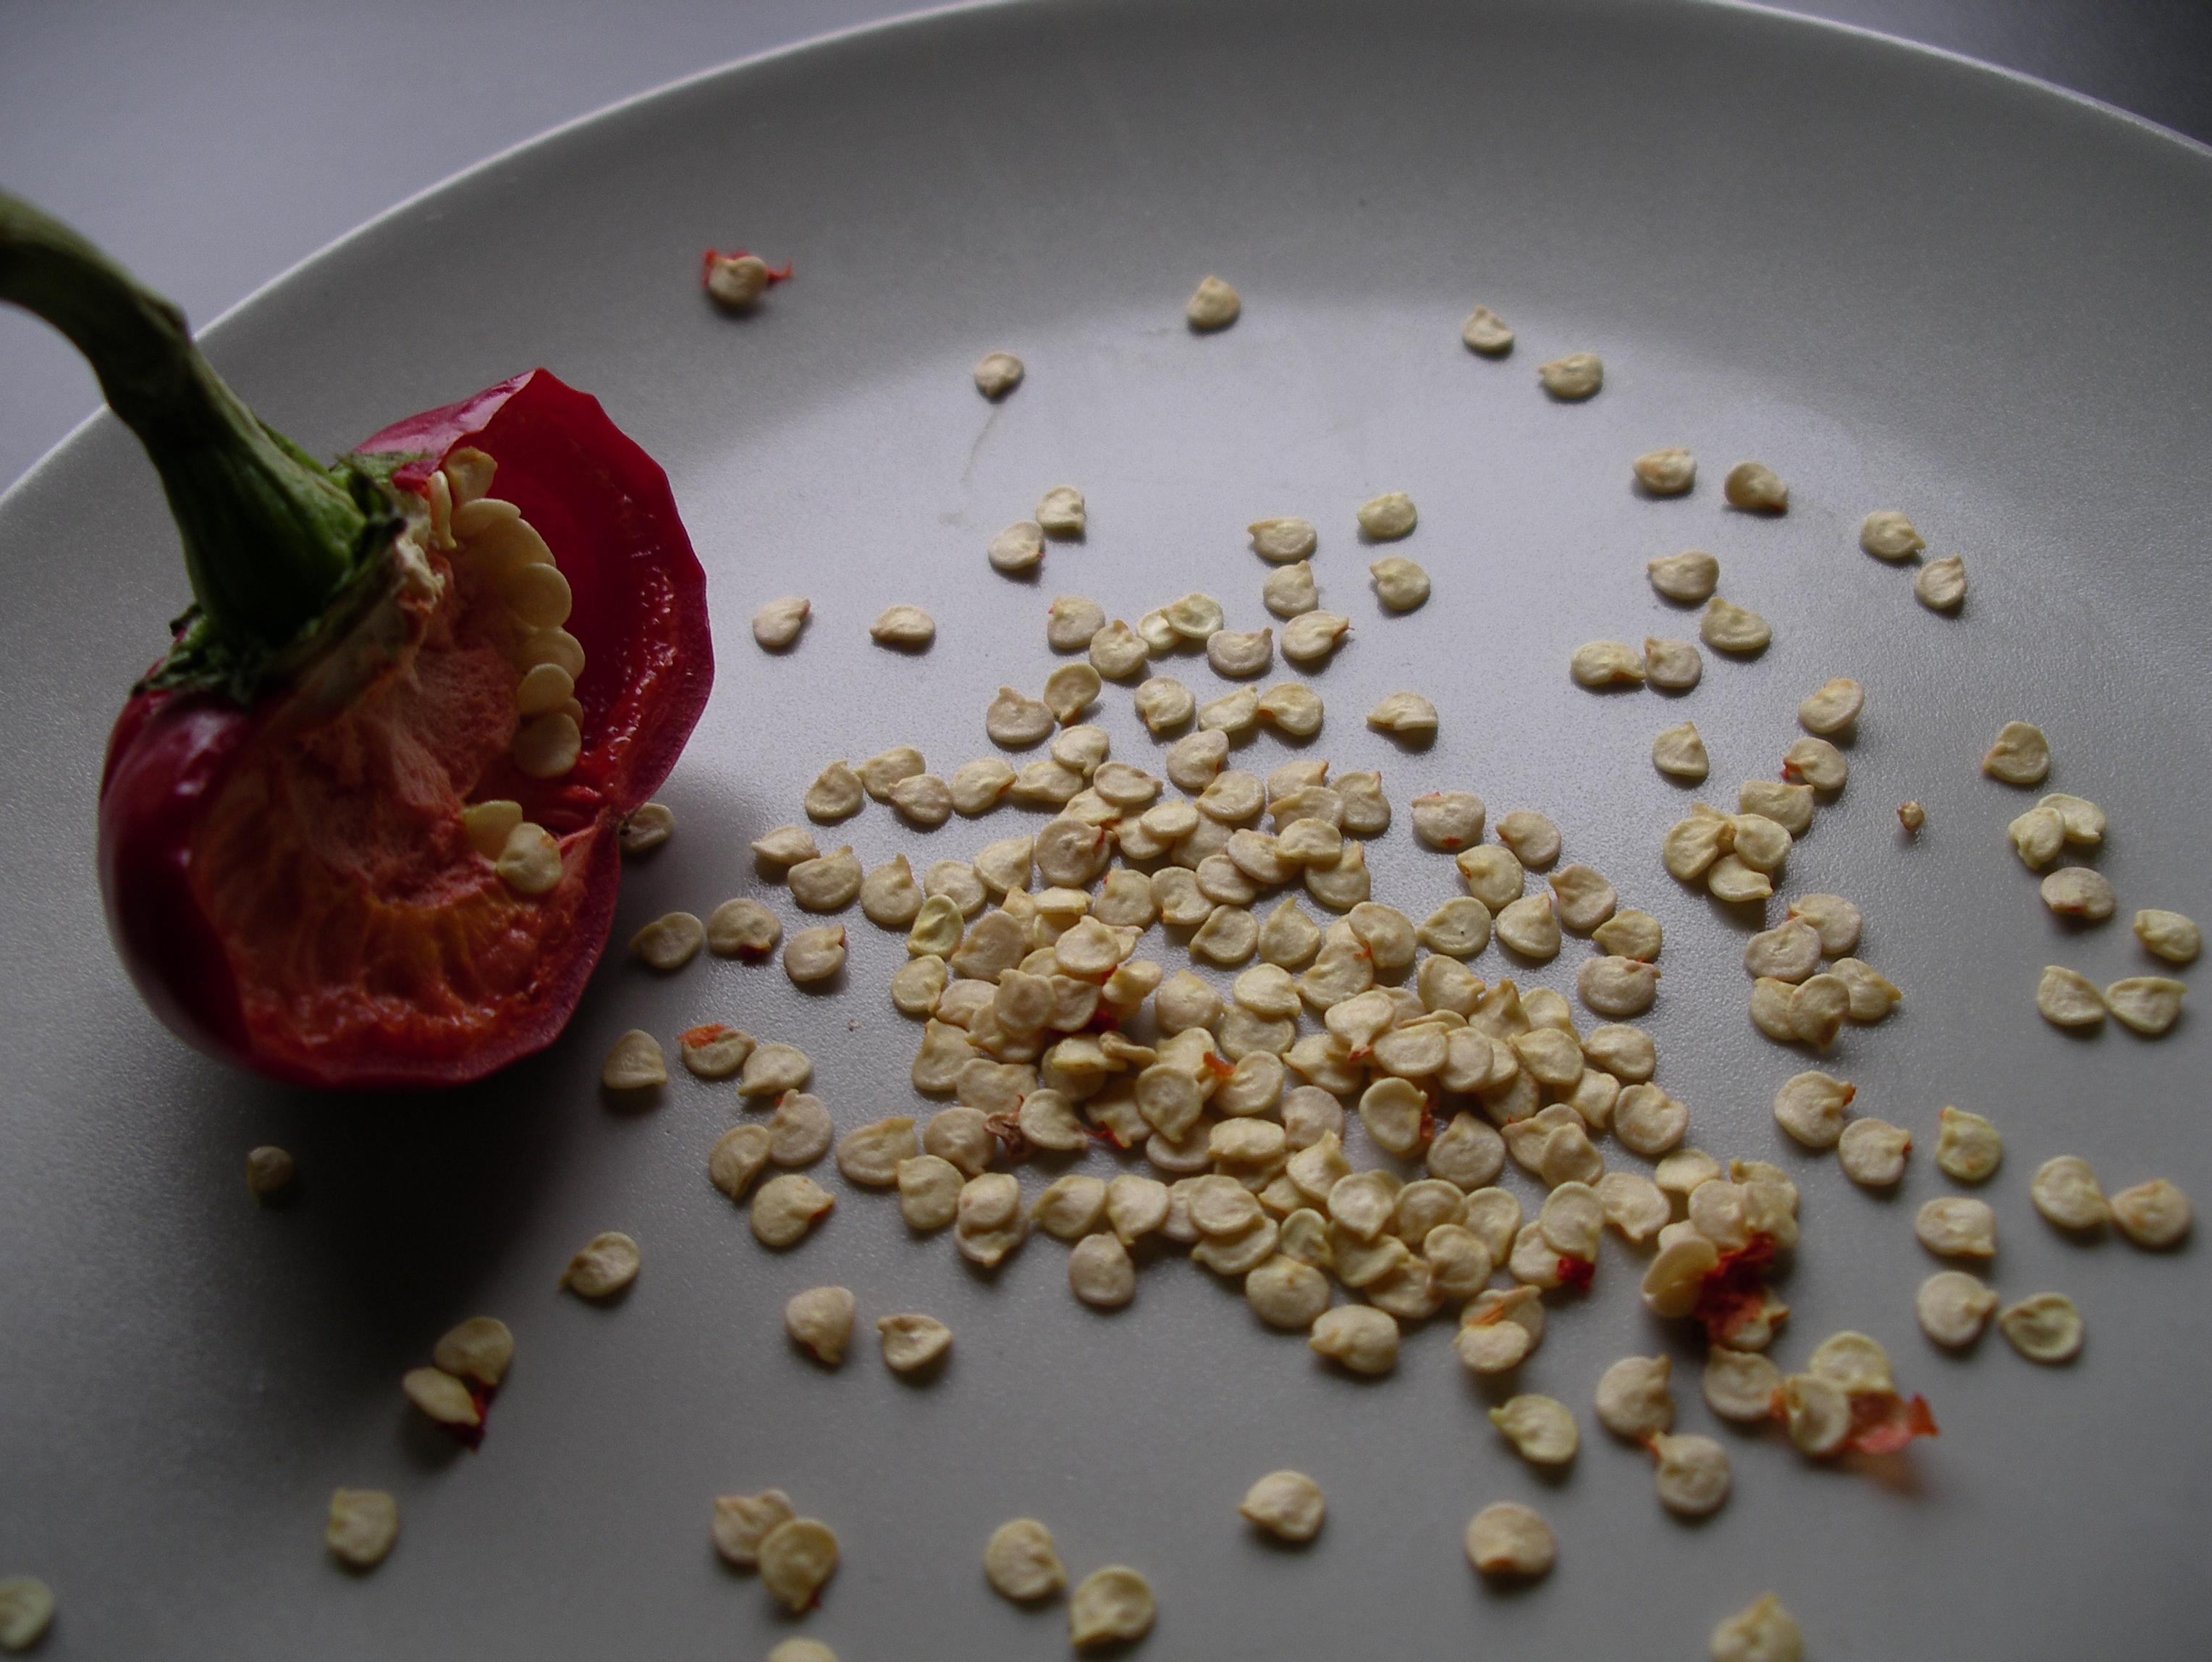 Seed Suppliers A Kitchen Garden Notebook